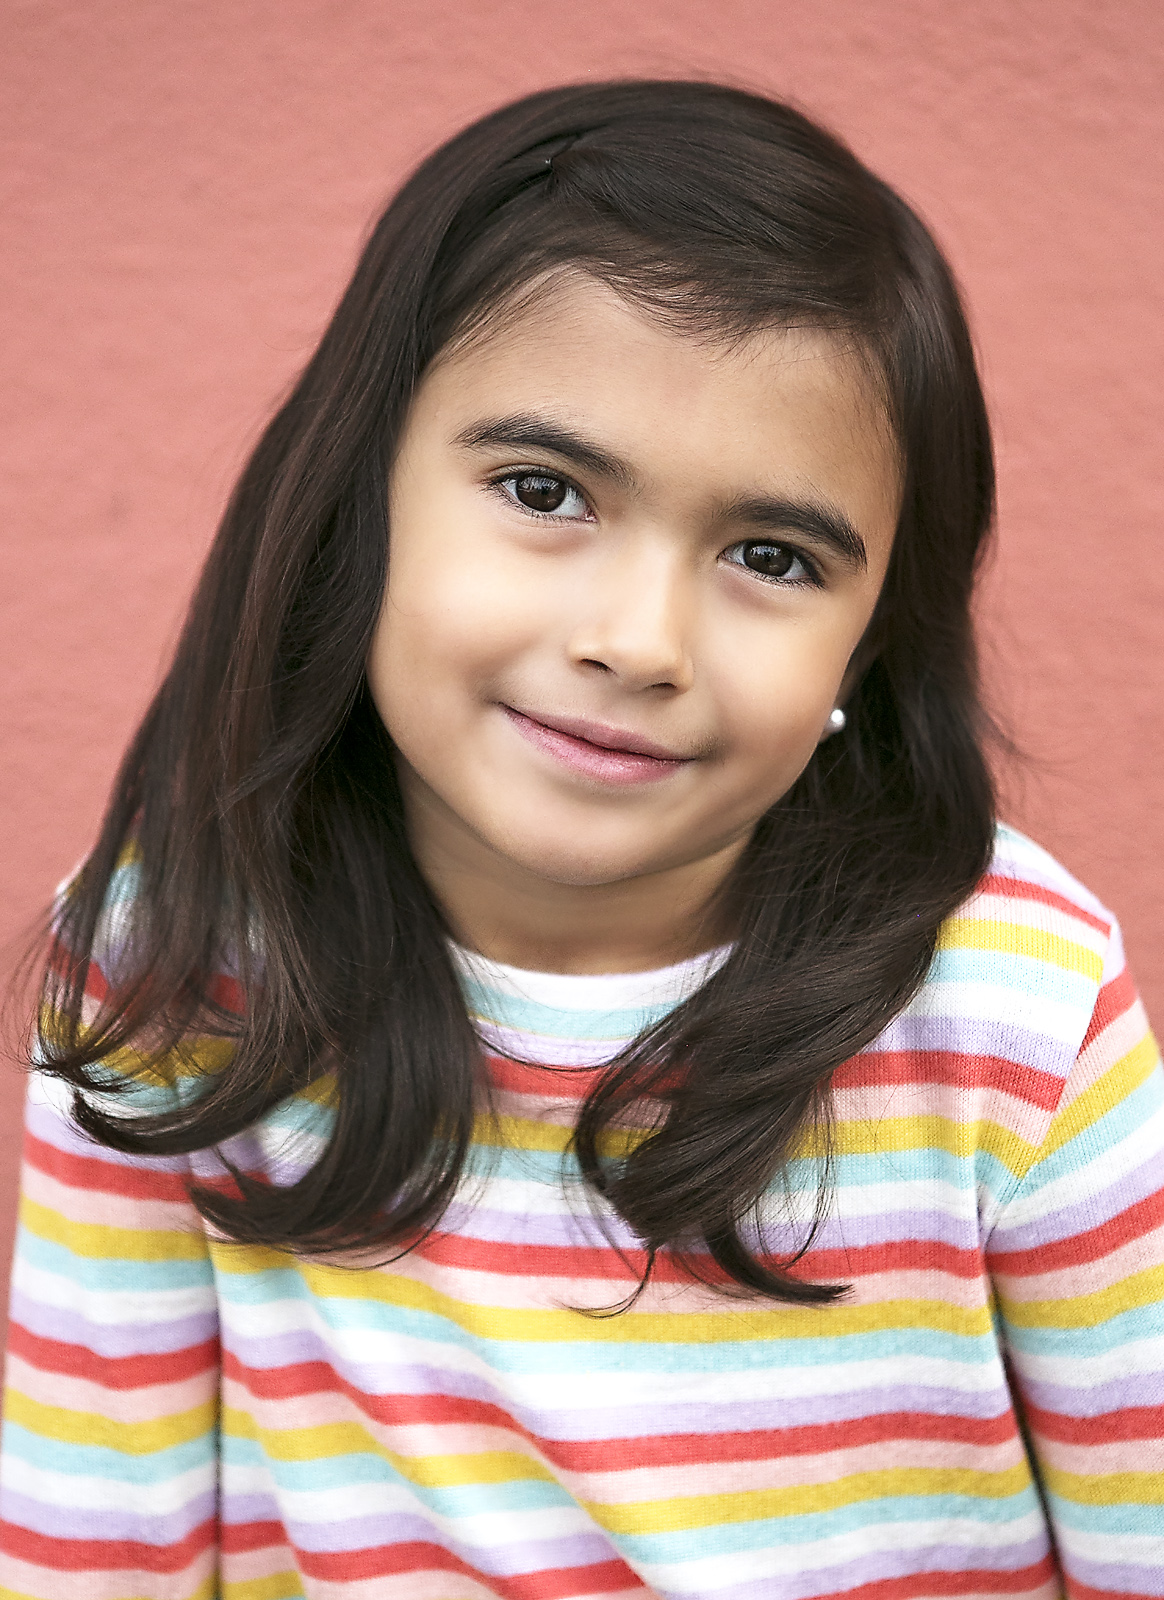 Los Angeles childrens photographer